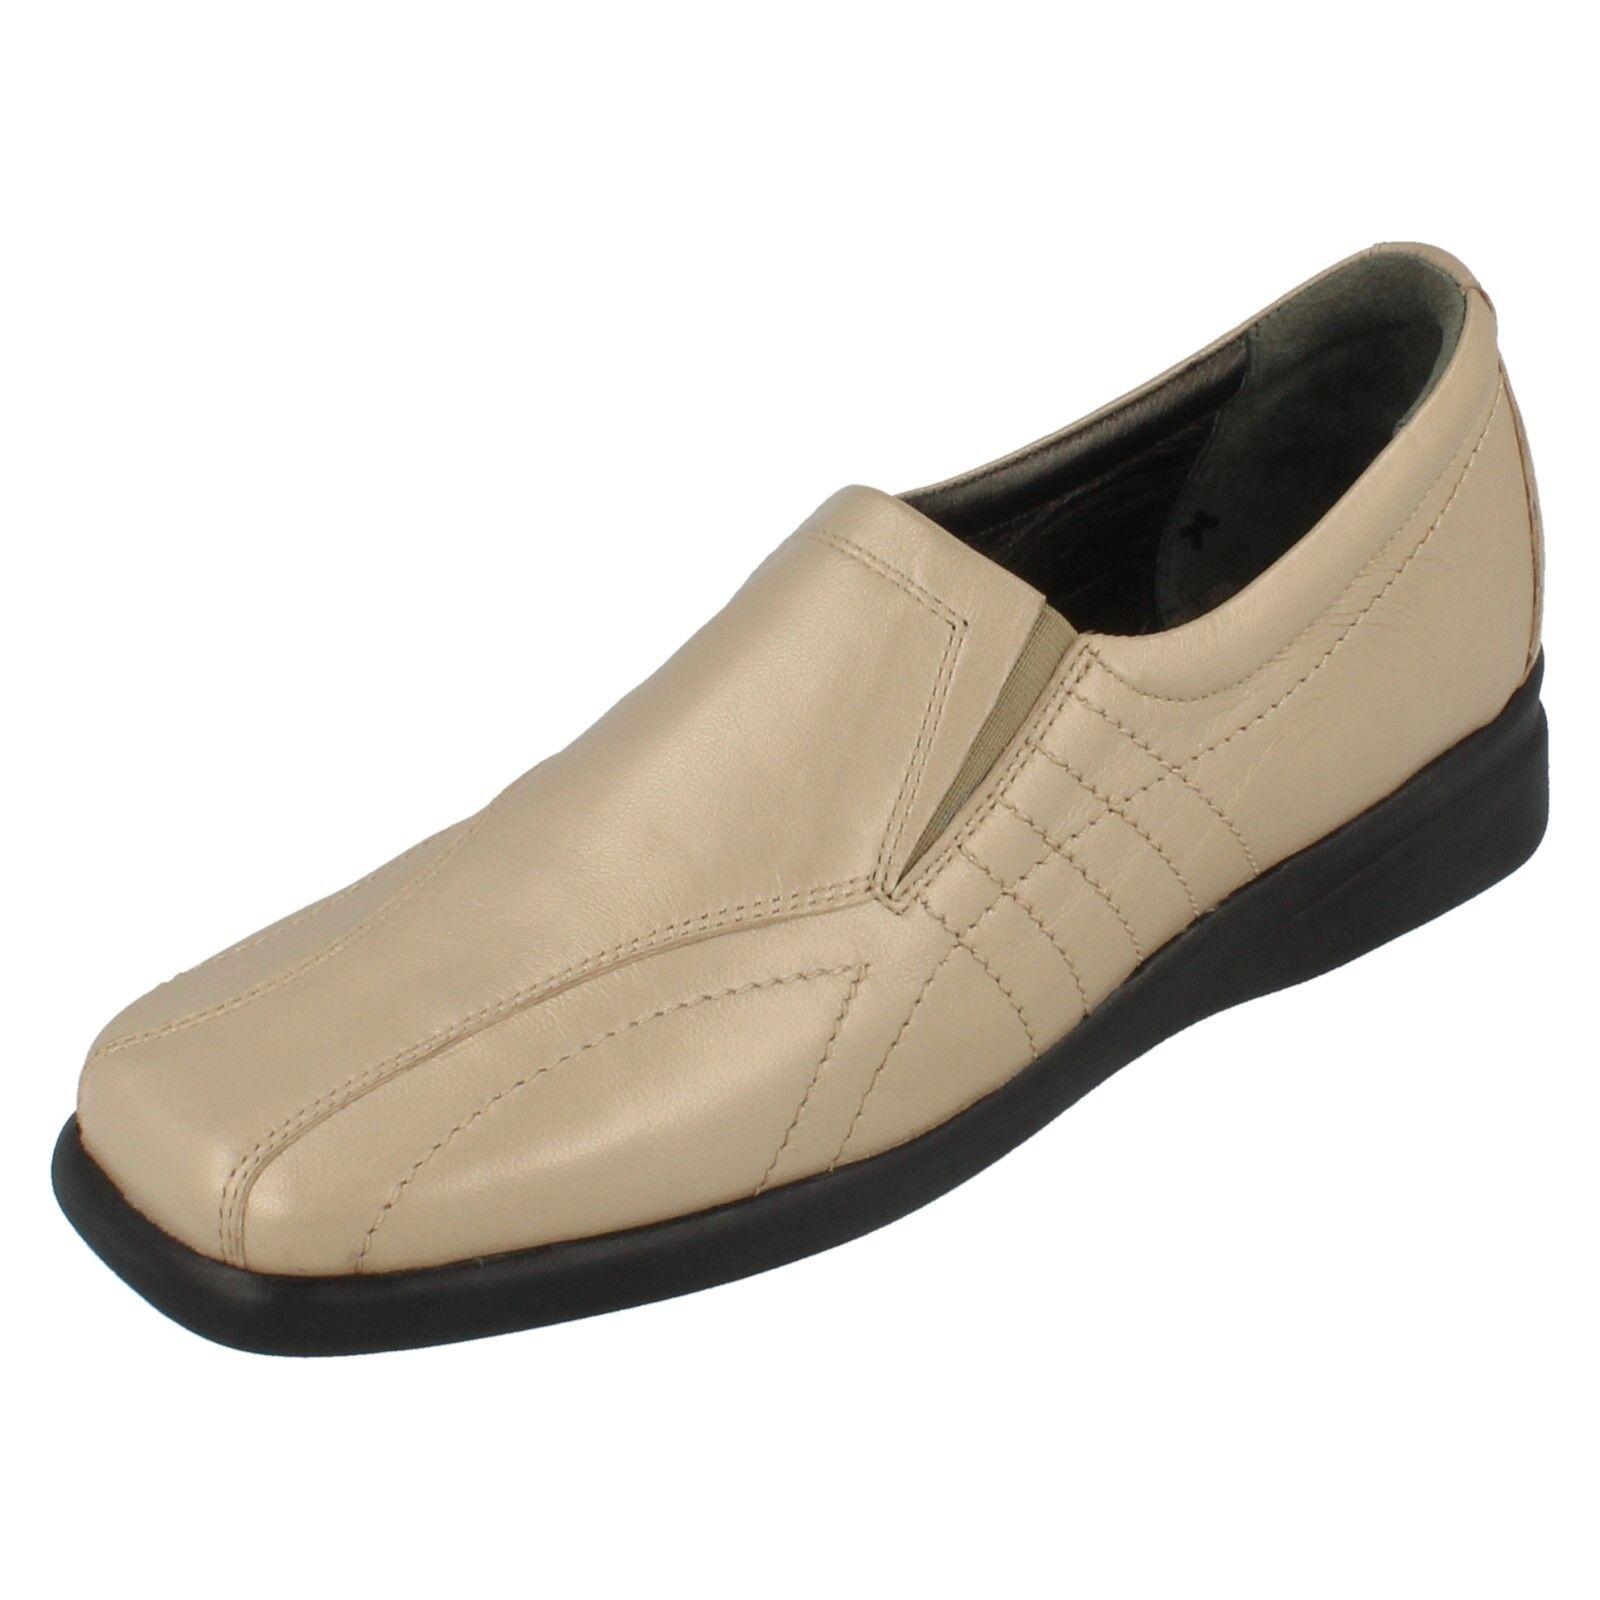 Damen Equity beige keilabsatz leather schuhe style SIRENA UK 4.5